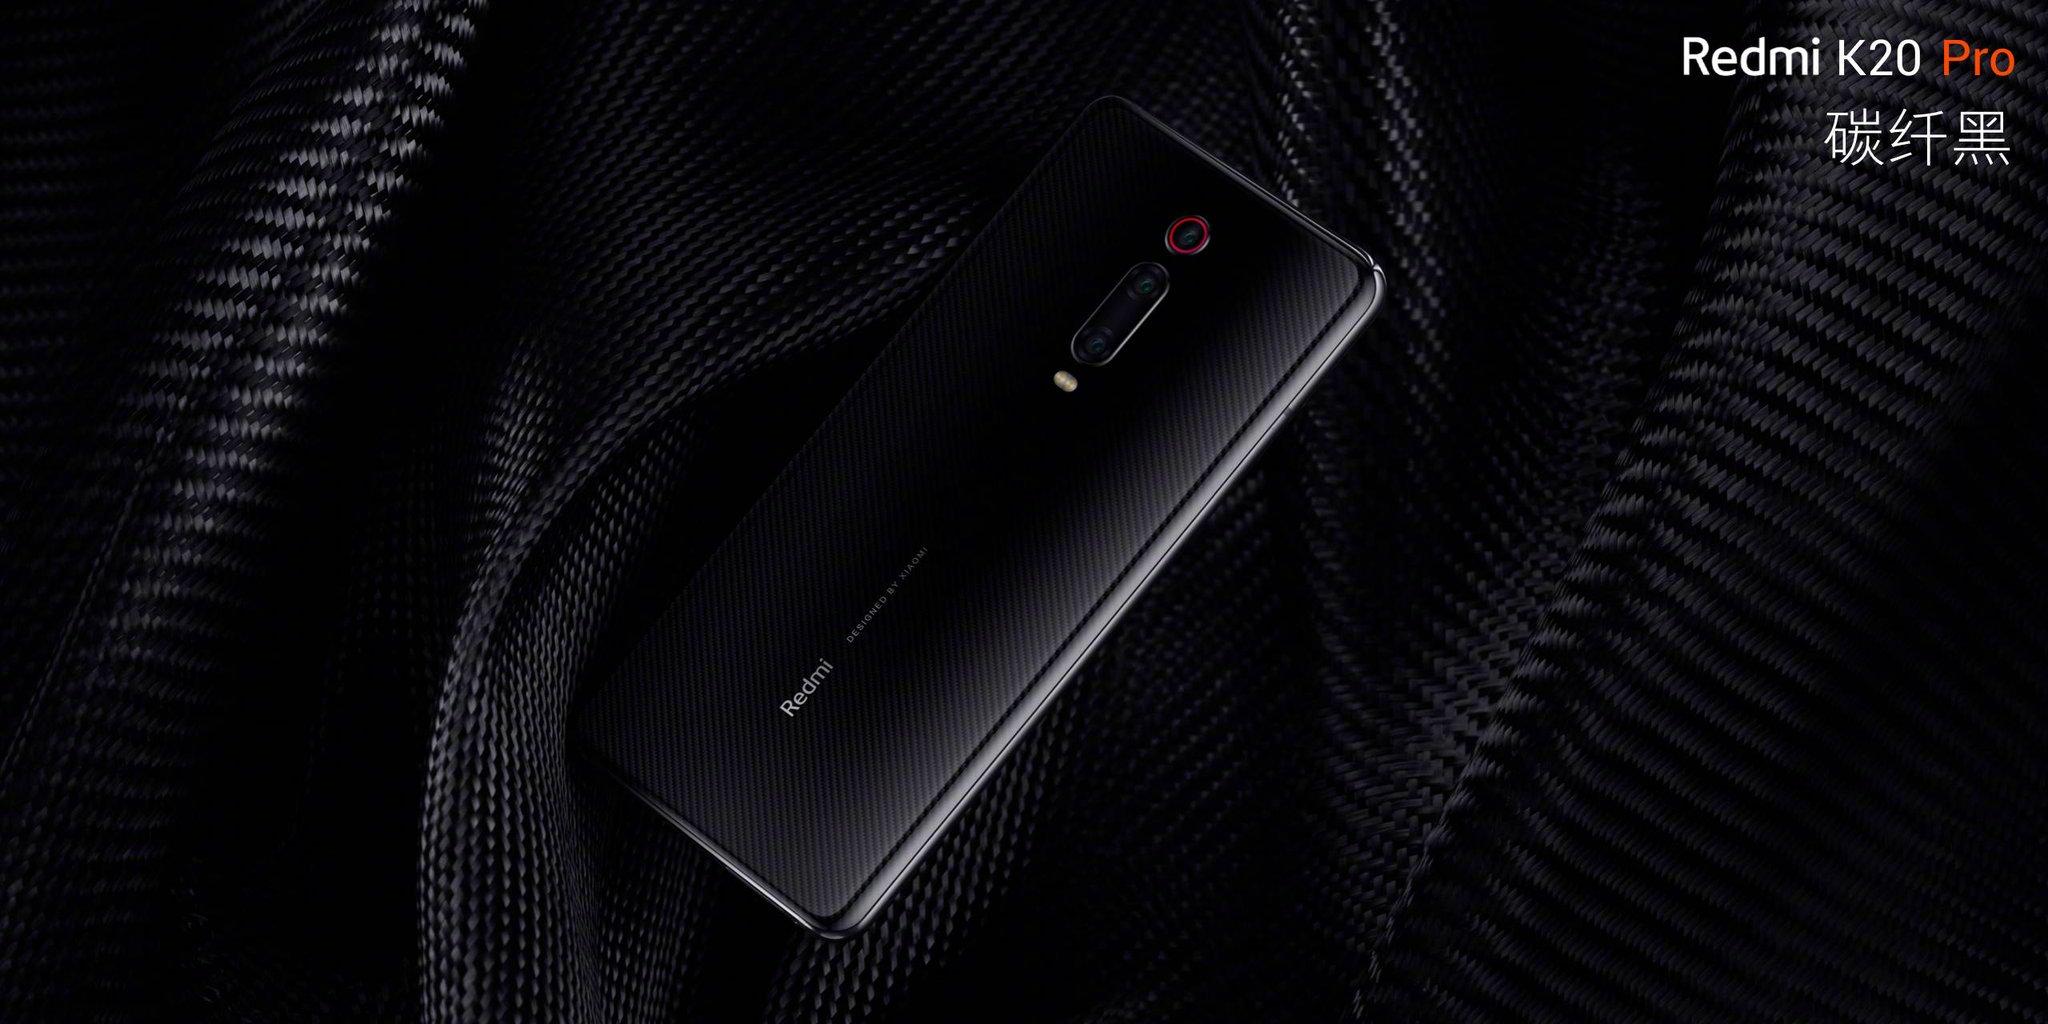 بعد التسريبات والتقارير ... Redmi تكشف رسميًا عن هاتفي Redmi K20 Pro وRedmi K20